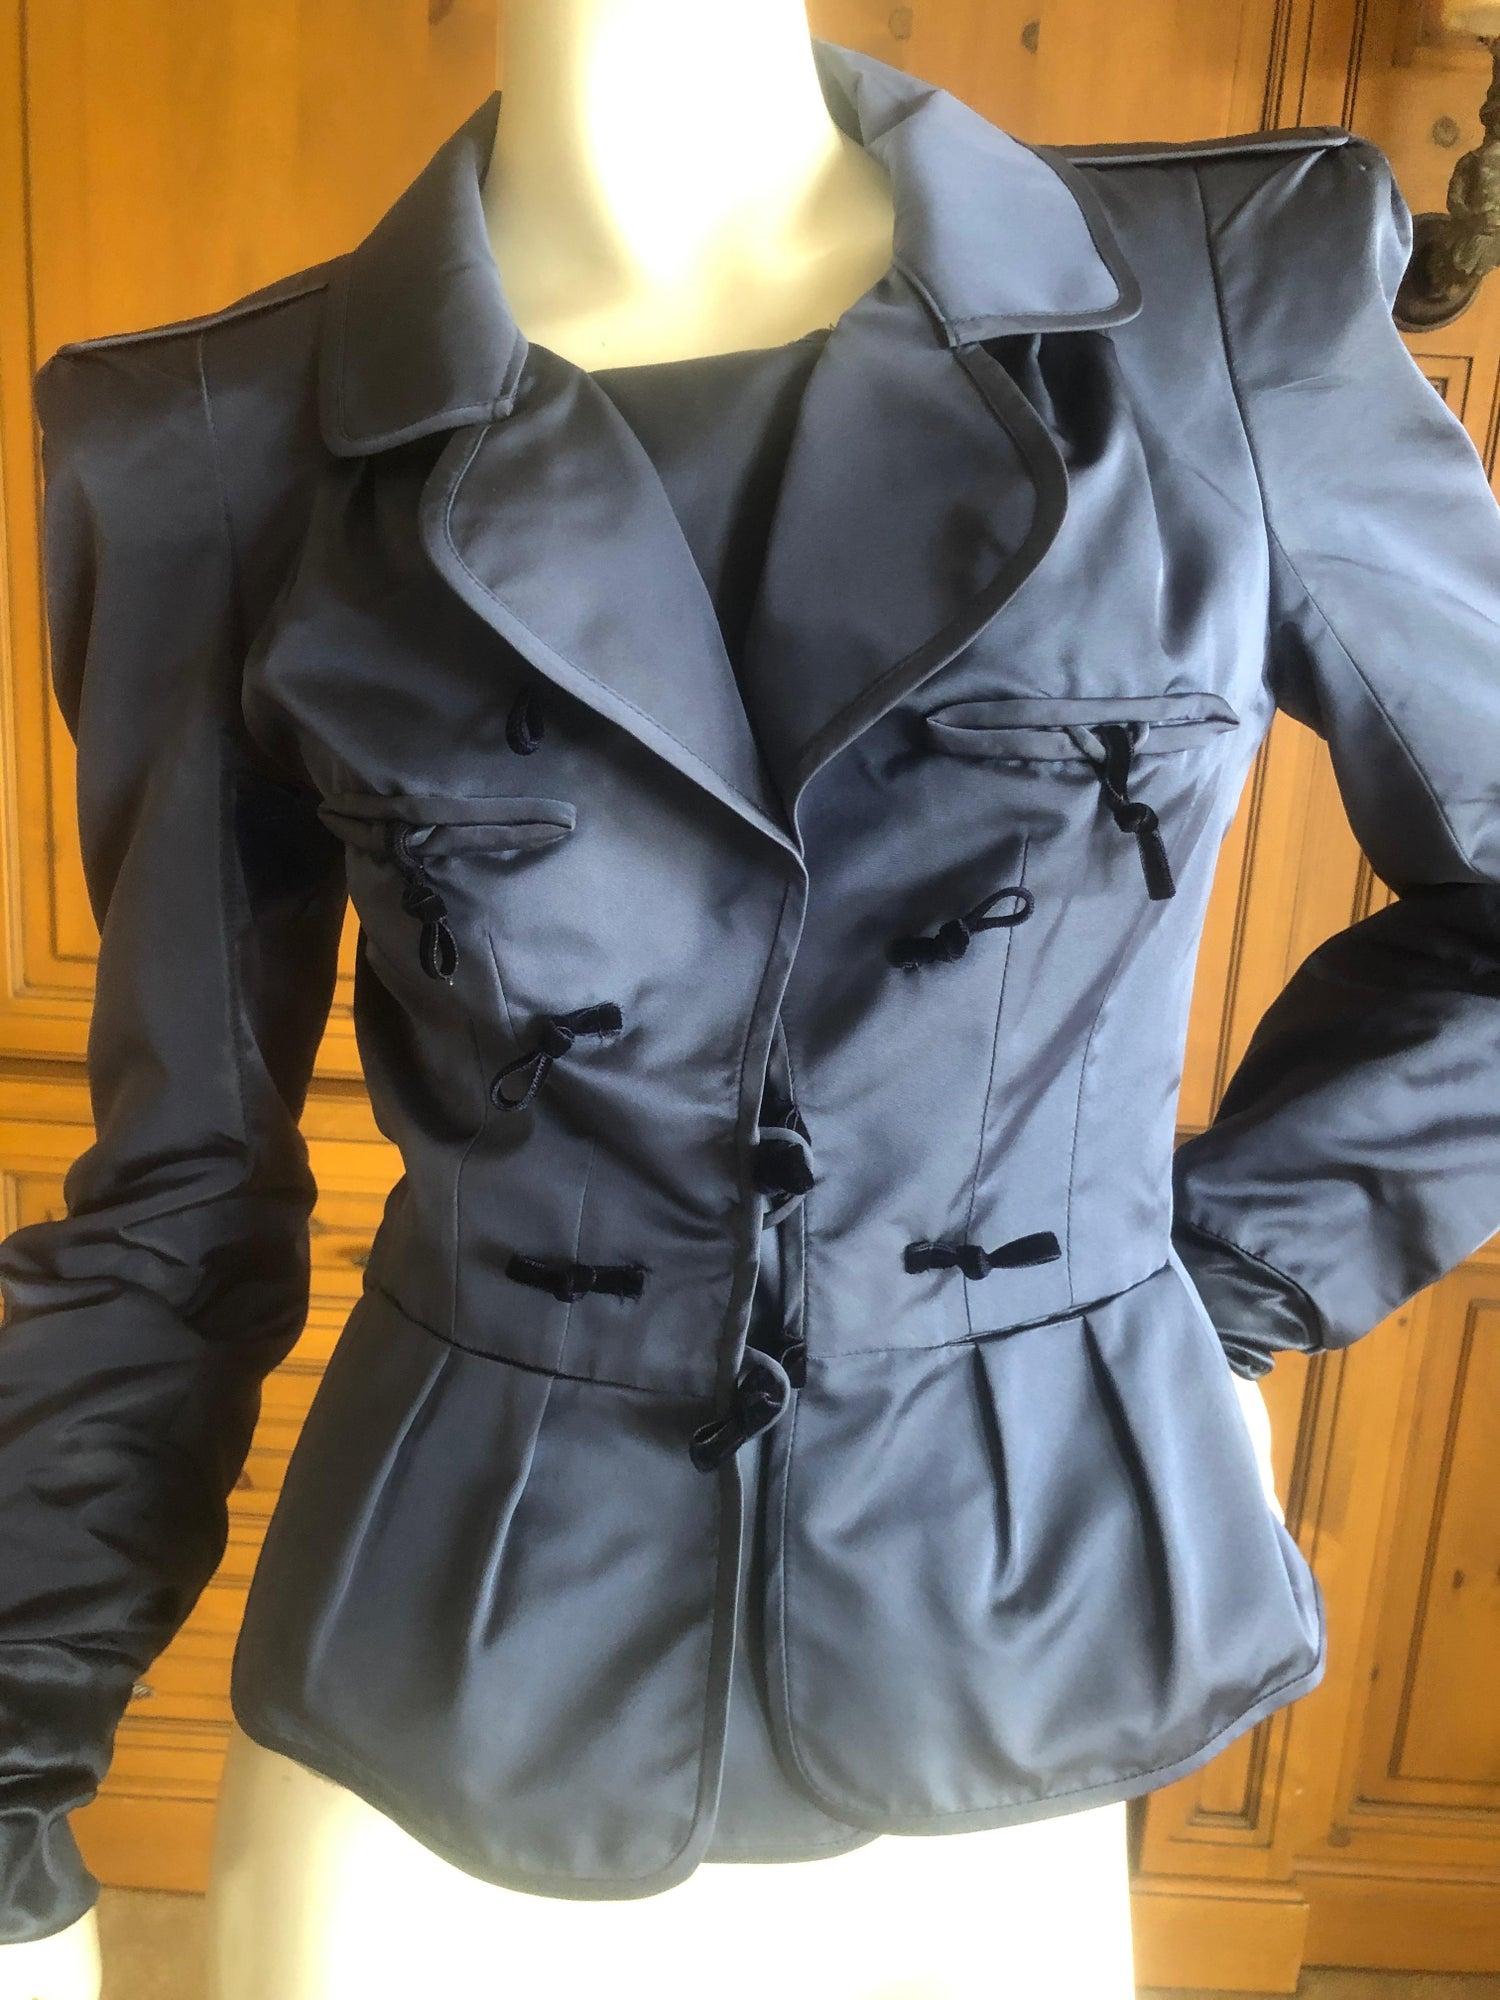 f9eec98dddb Yves Saint Laurent Tom Ford Fall 2004 Teal Blue Silk Pagoda Shoulder Jacket  For Sale at 1stdibs